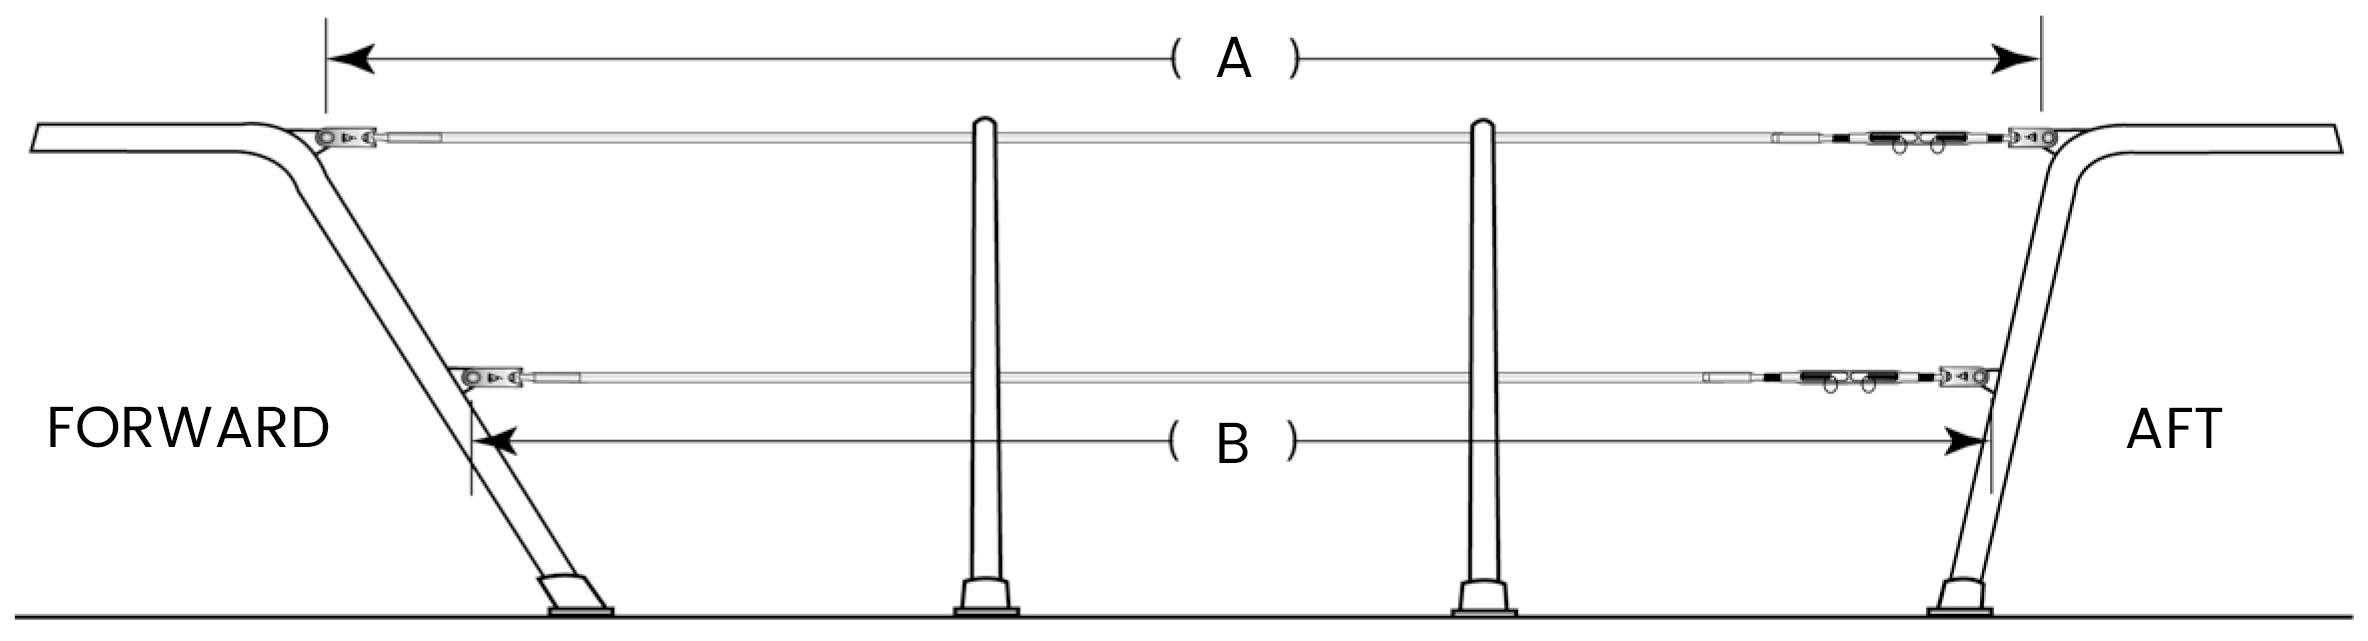 Sailboat Measurement Form - No Gate